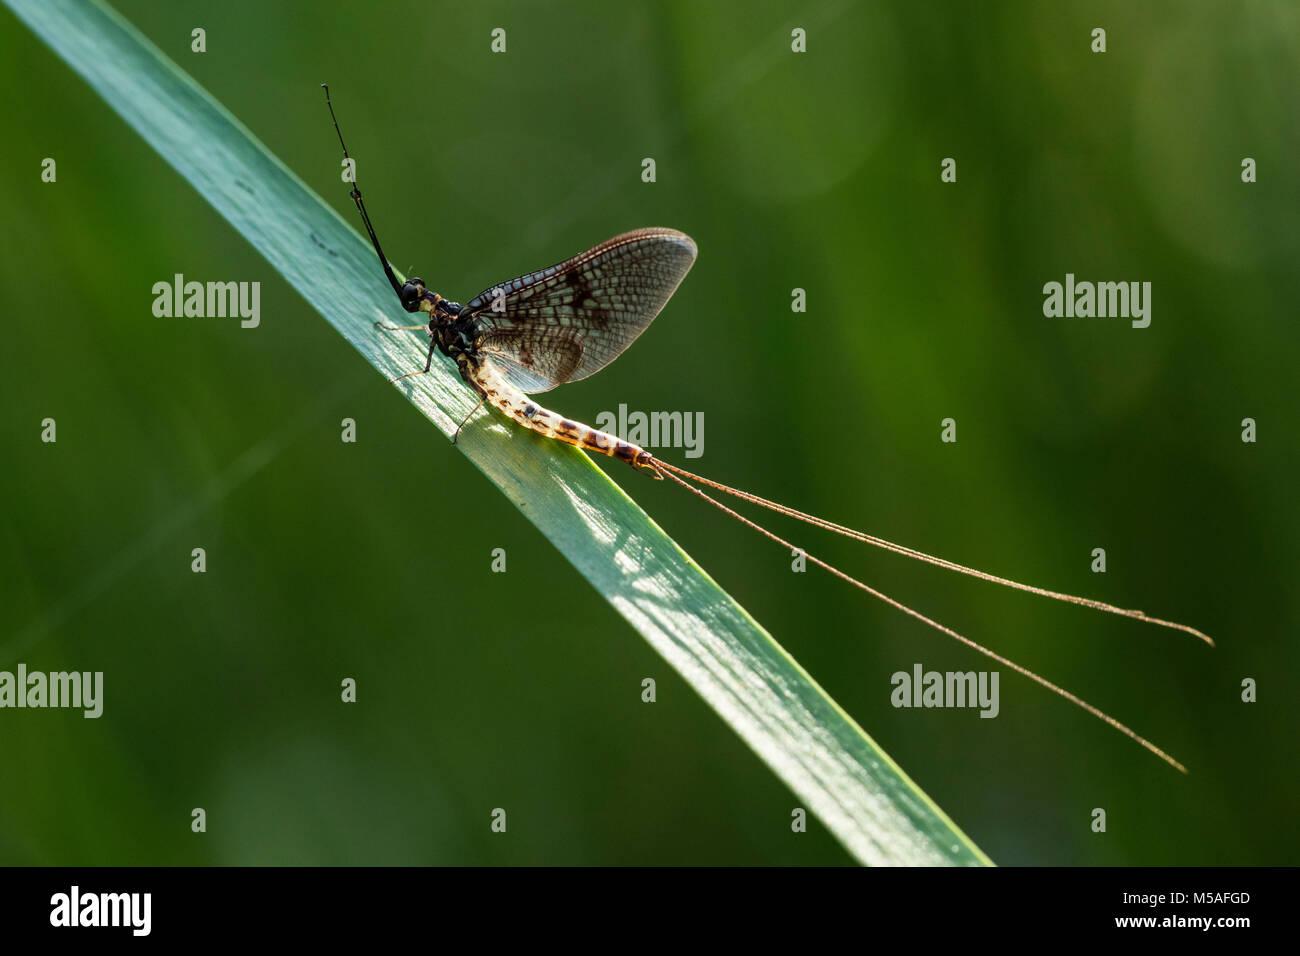 Mayfly (Ephemera danica), (Ephemeridae) - Stock Image